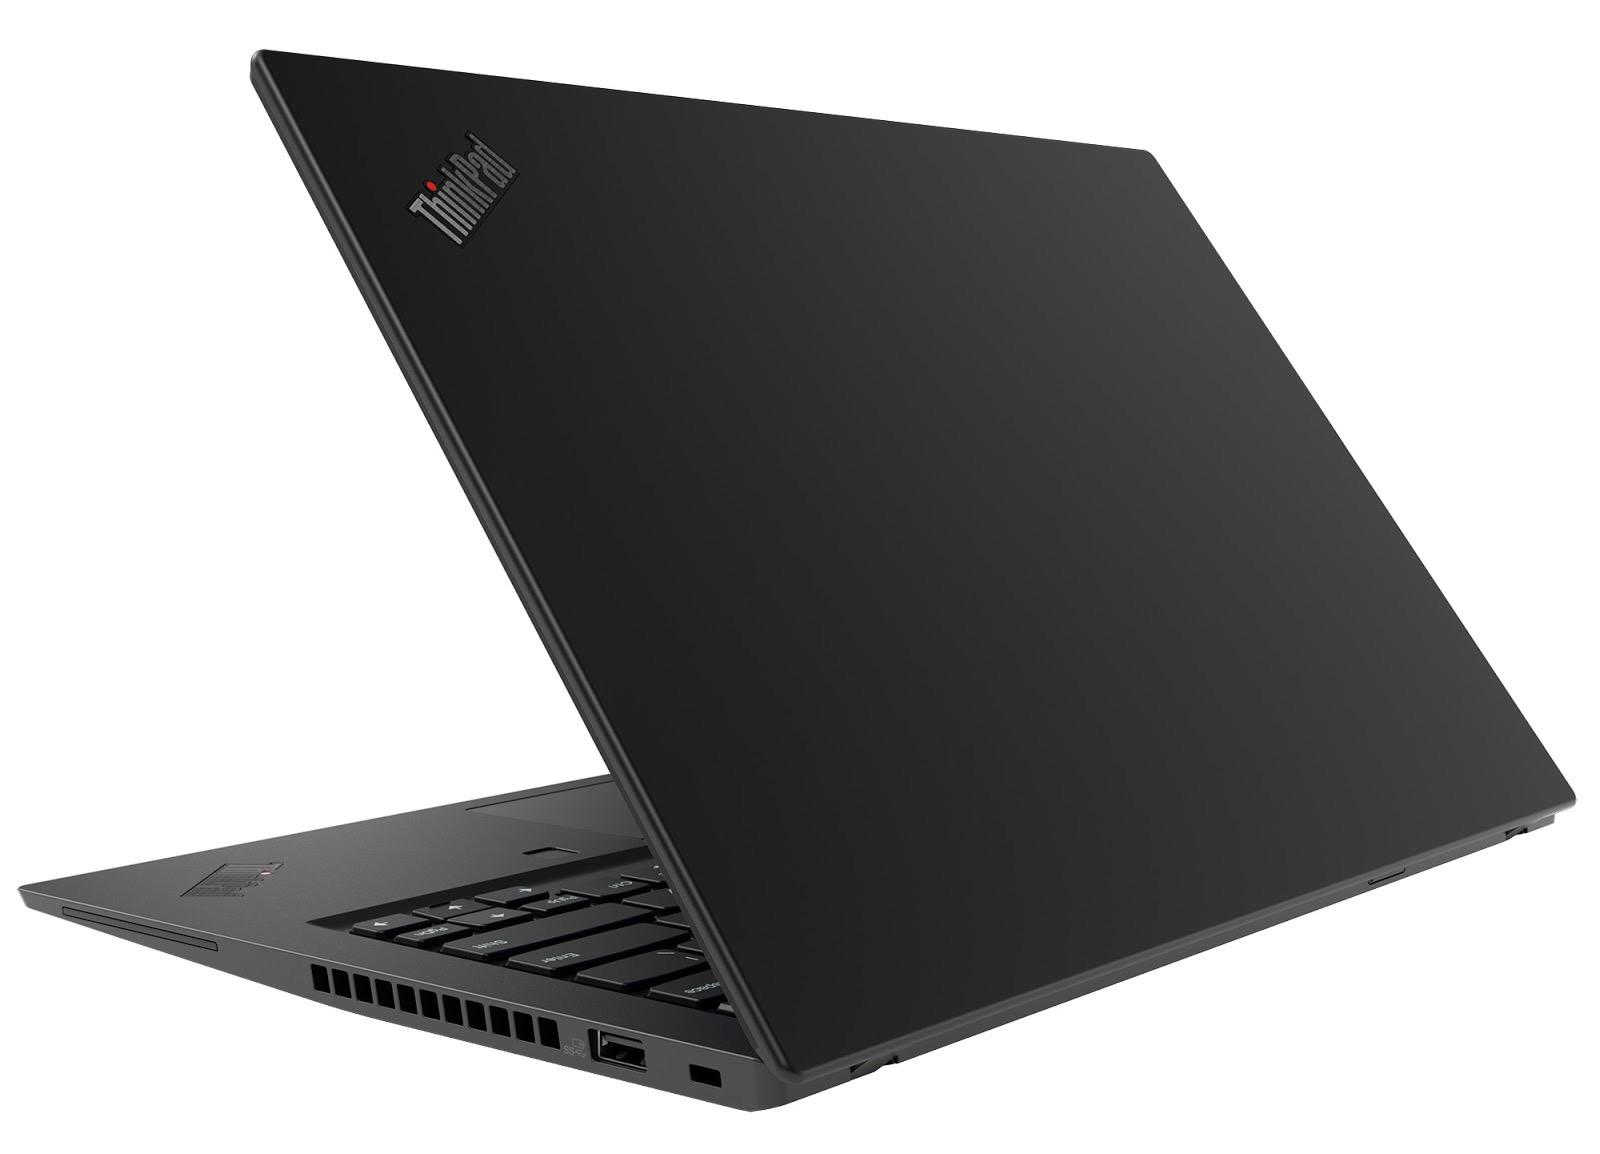 Фото 2. Ноутбук Lenovo ThinkPad T14s Gen 1 Black (20T00017RT)